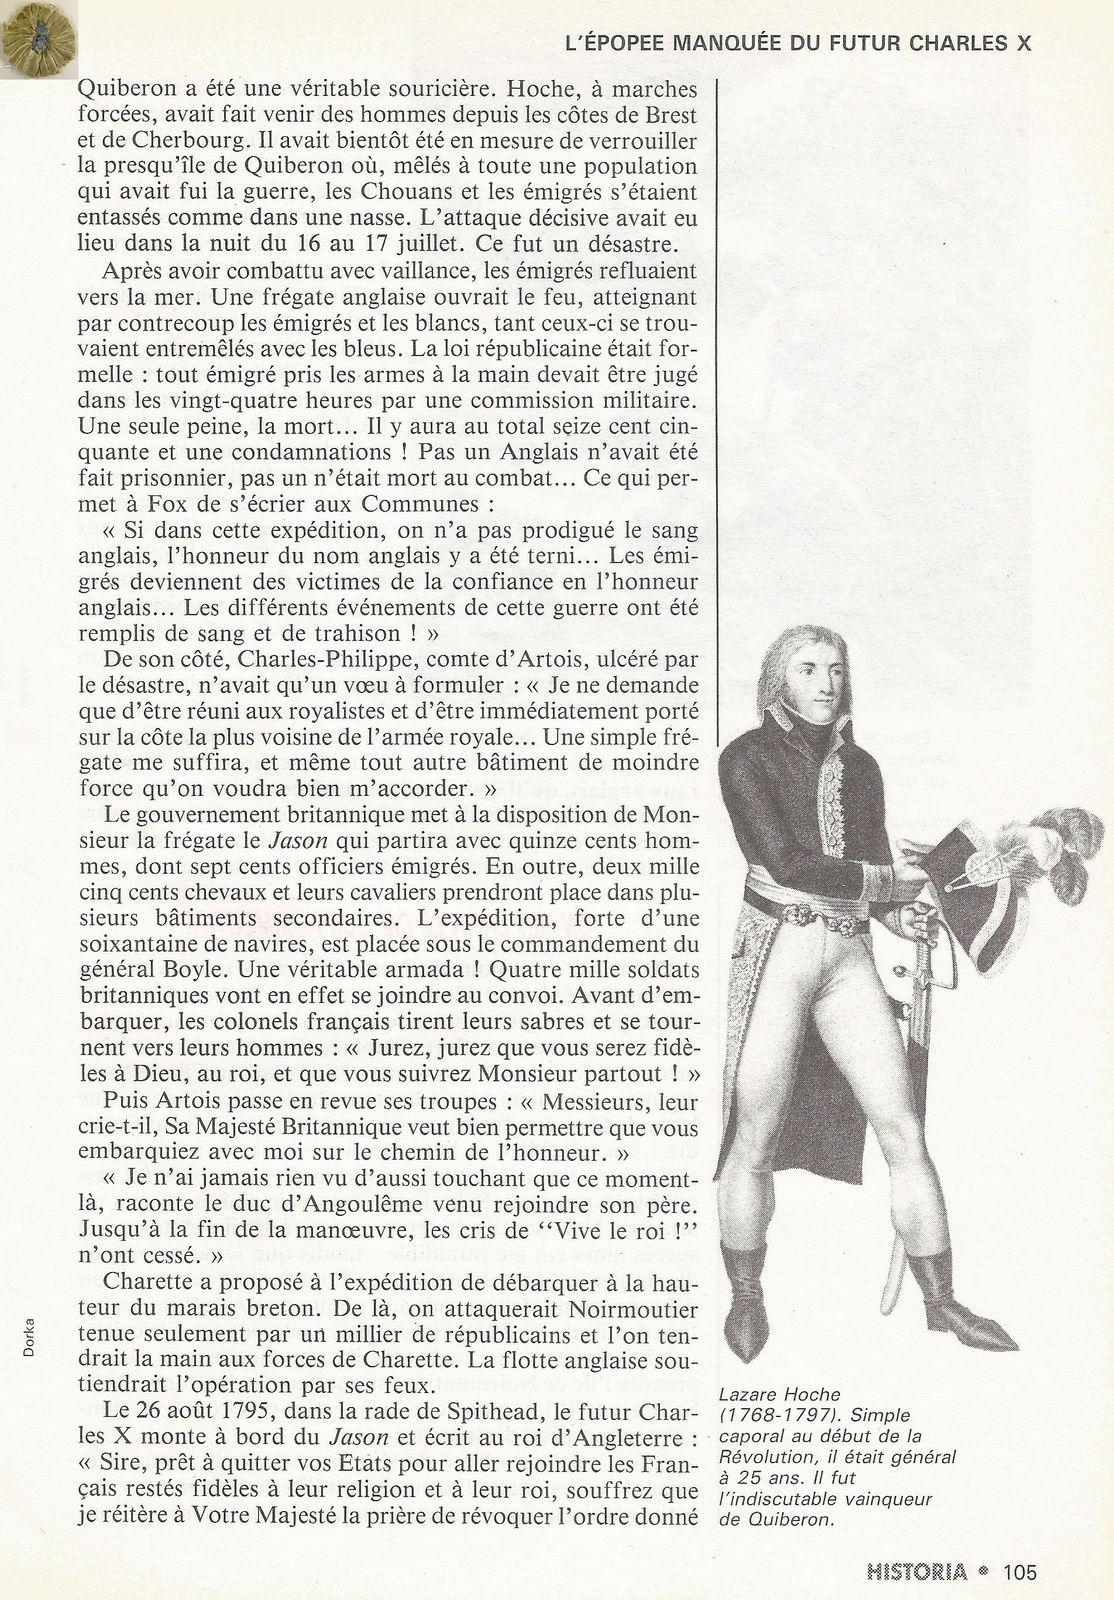 HISTORIA NUMÉRO 500 - AOÛT 1988